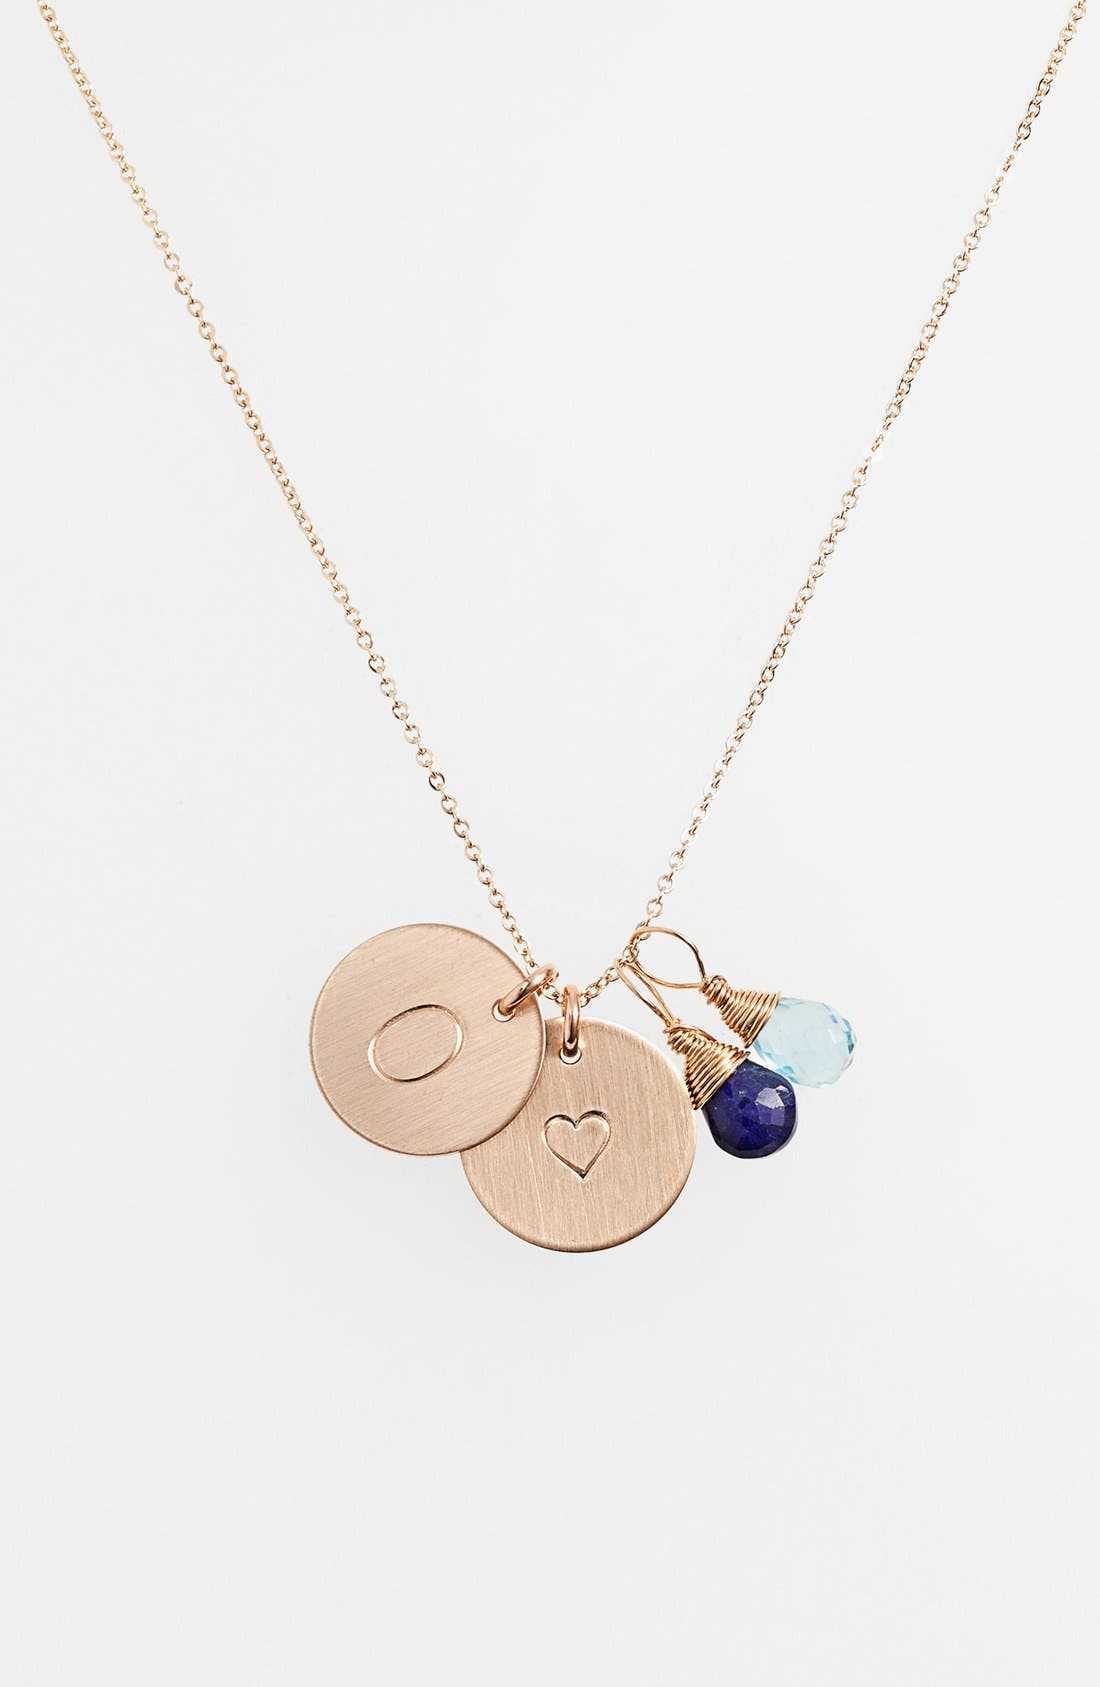 Blue Quartz Initial & Heart 14k-Gold Fill Disc Necklace,                             Main thumbnail 1, color,                             Royal Blue And Ocean Blue O